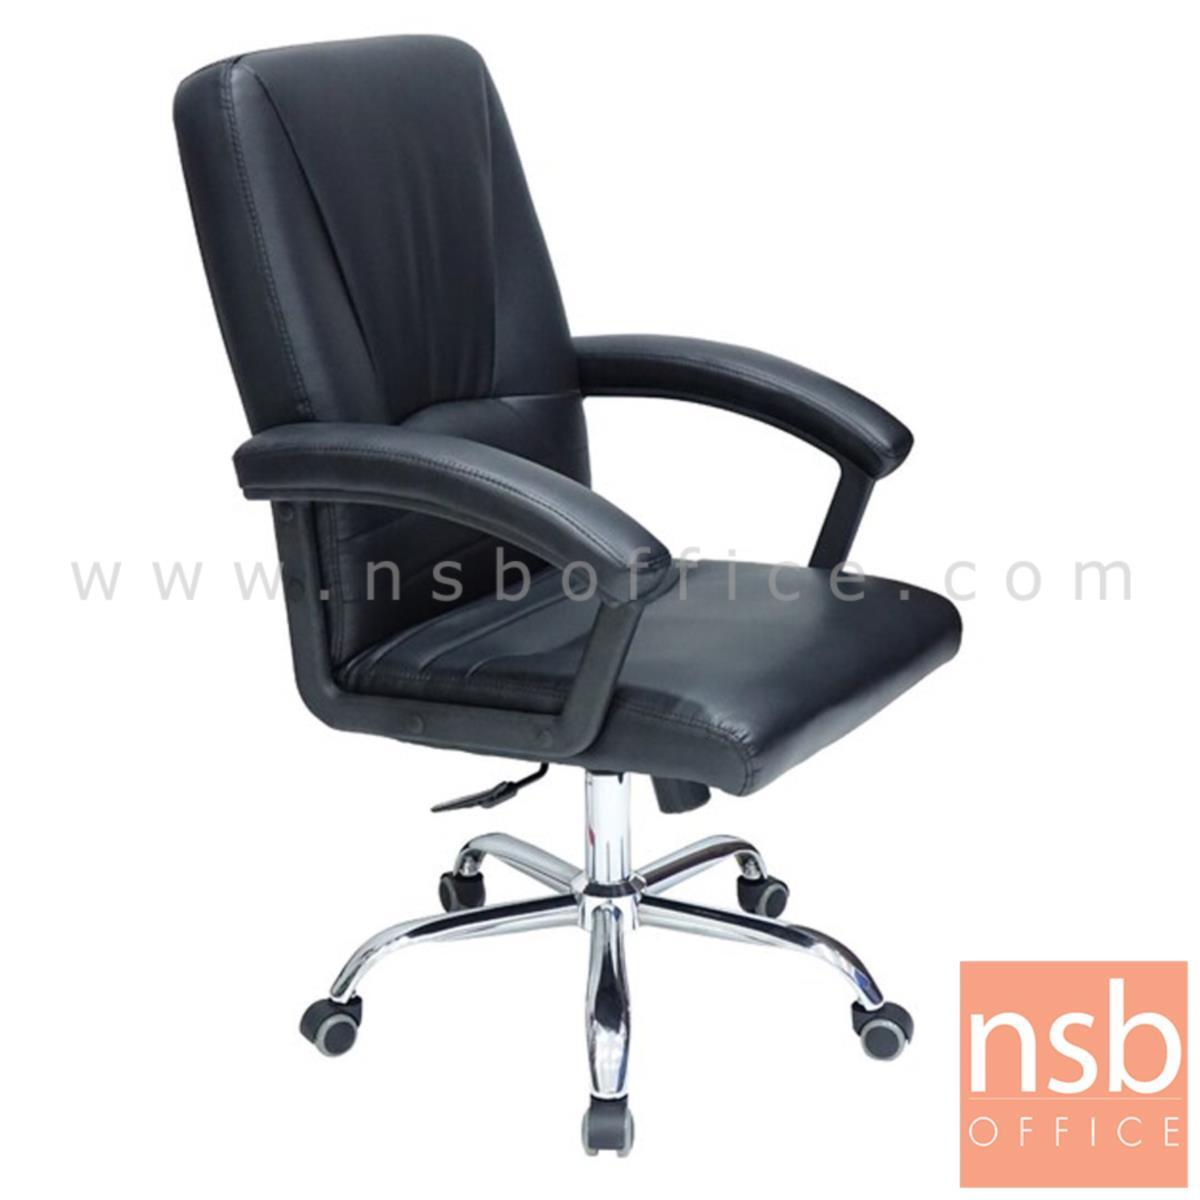 B01A513:เก้าอี้ผู้บริหาร รุ่น Vernon (เวอร์น่อน)  โช๊คแก๊ส ก้อนโยก